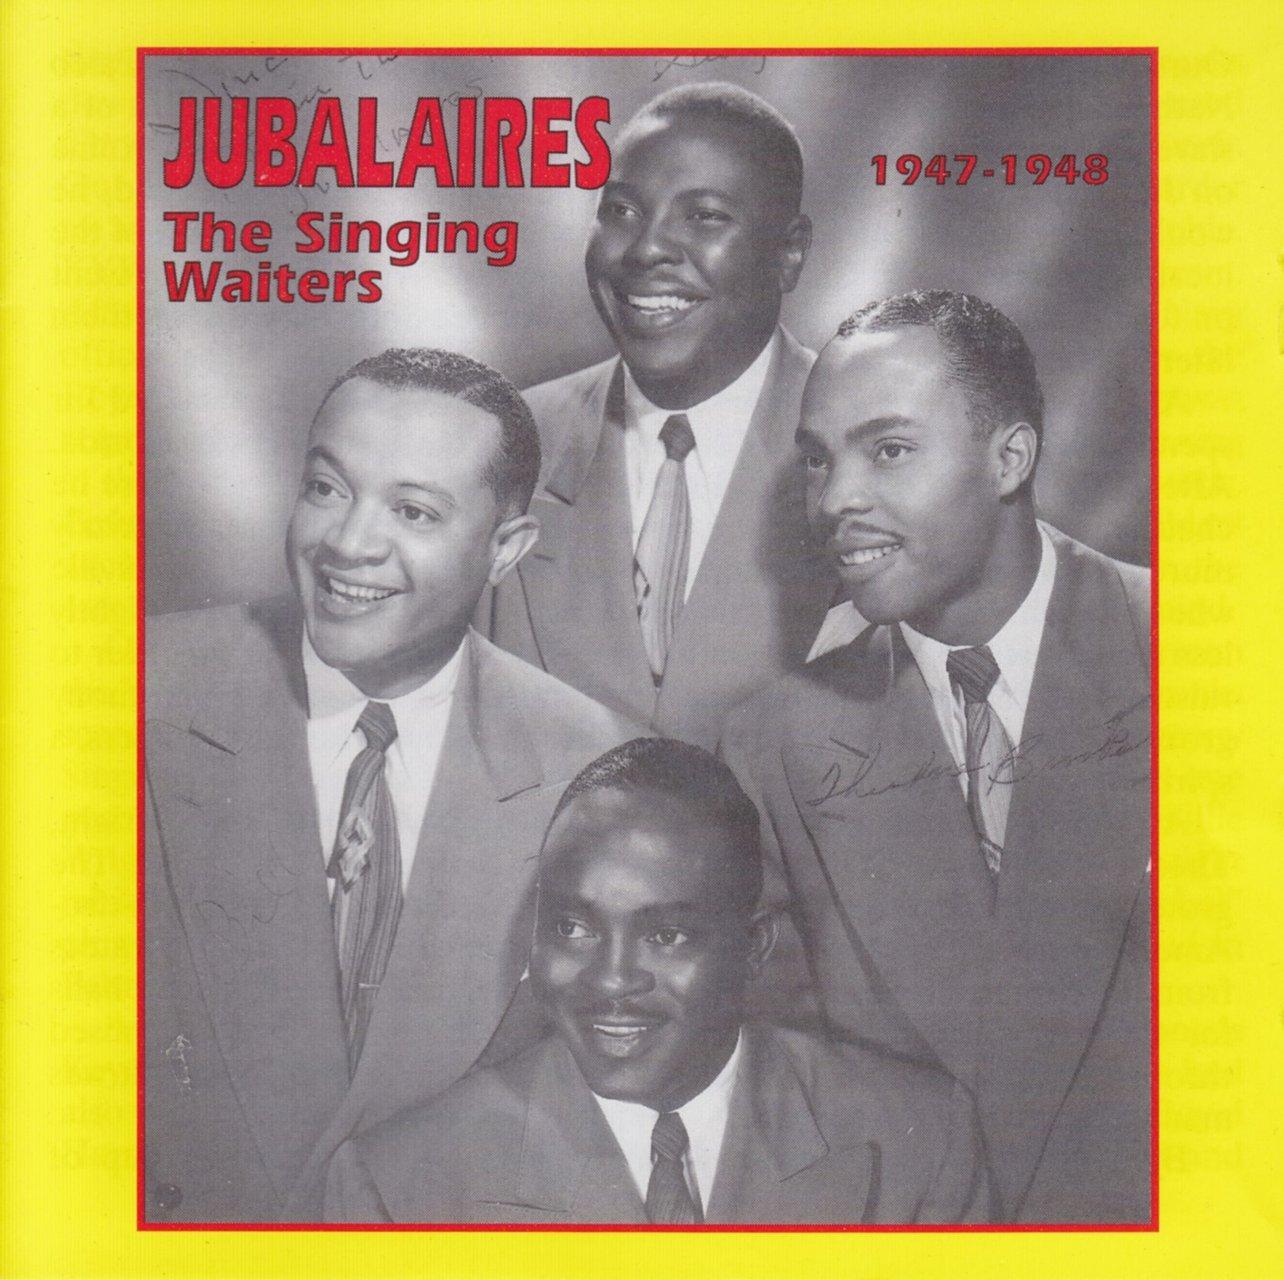 The Singing Waiters: 1947-1948